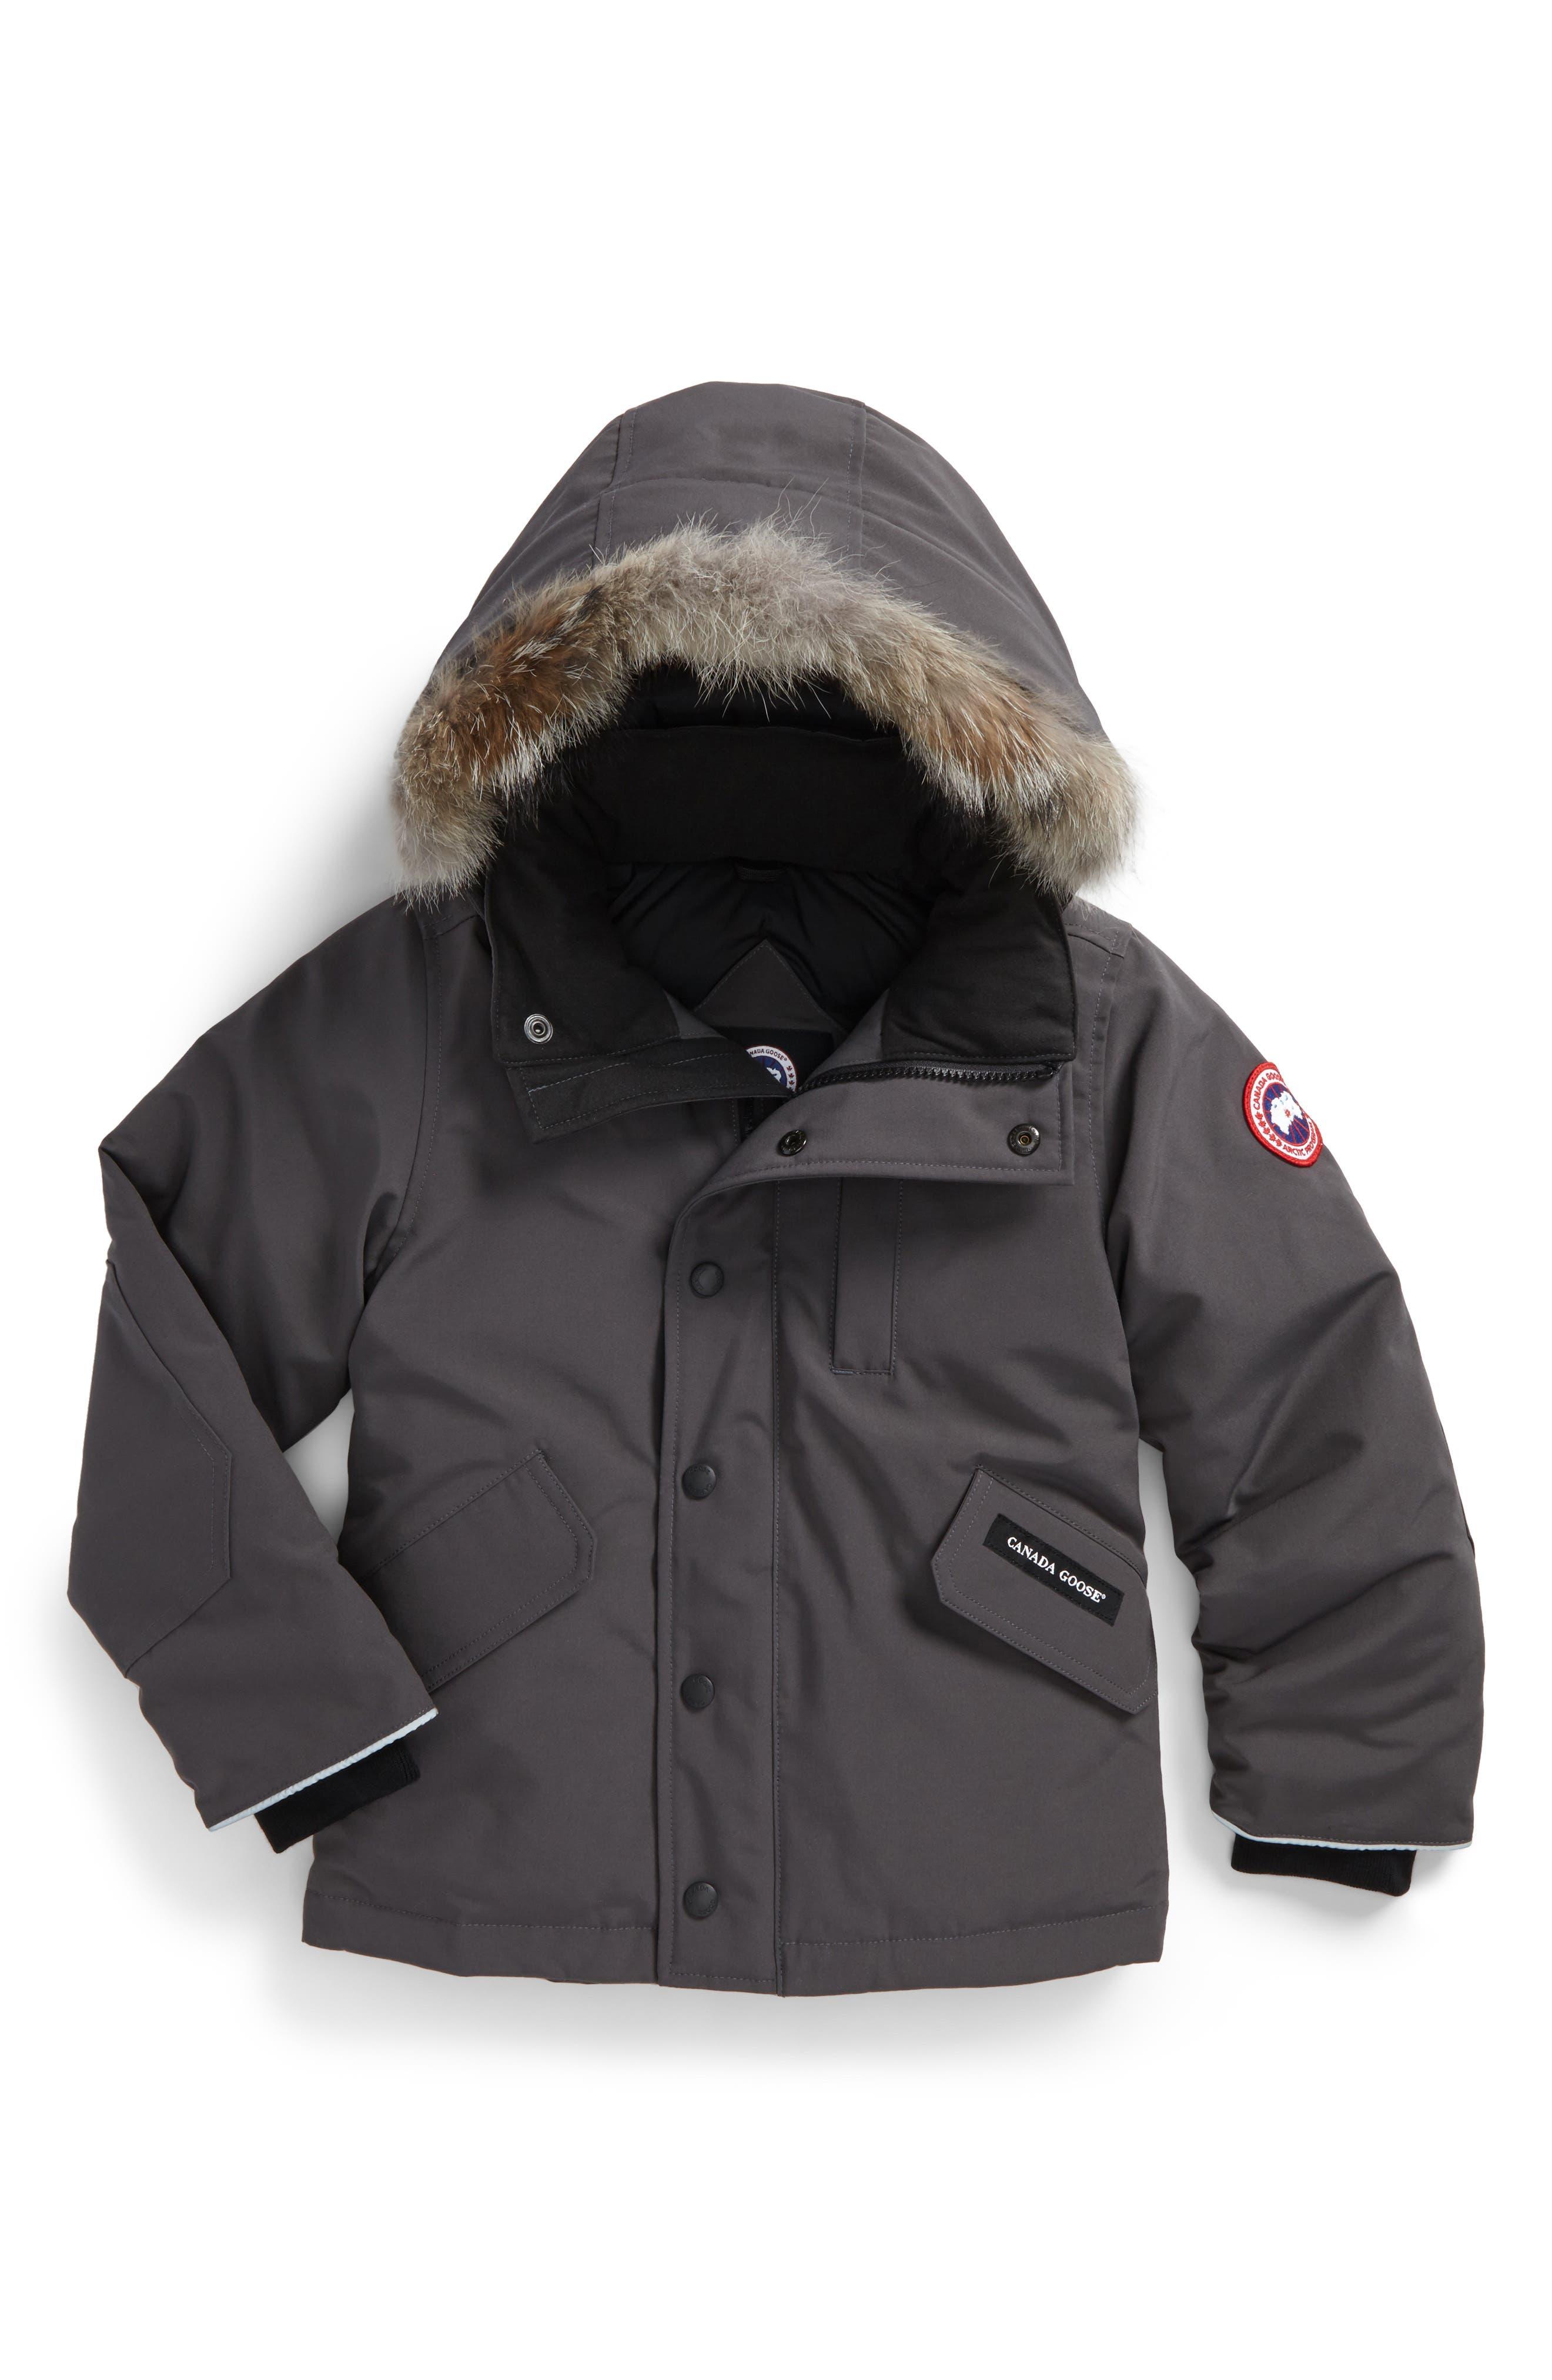 canada goose women s men s kids coats outerwear jackets rh shop nordstrom com